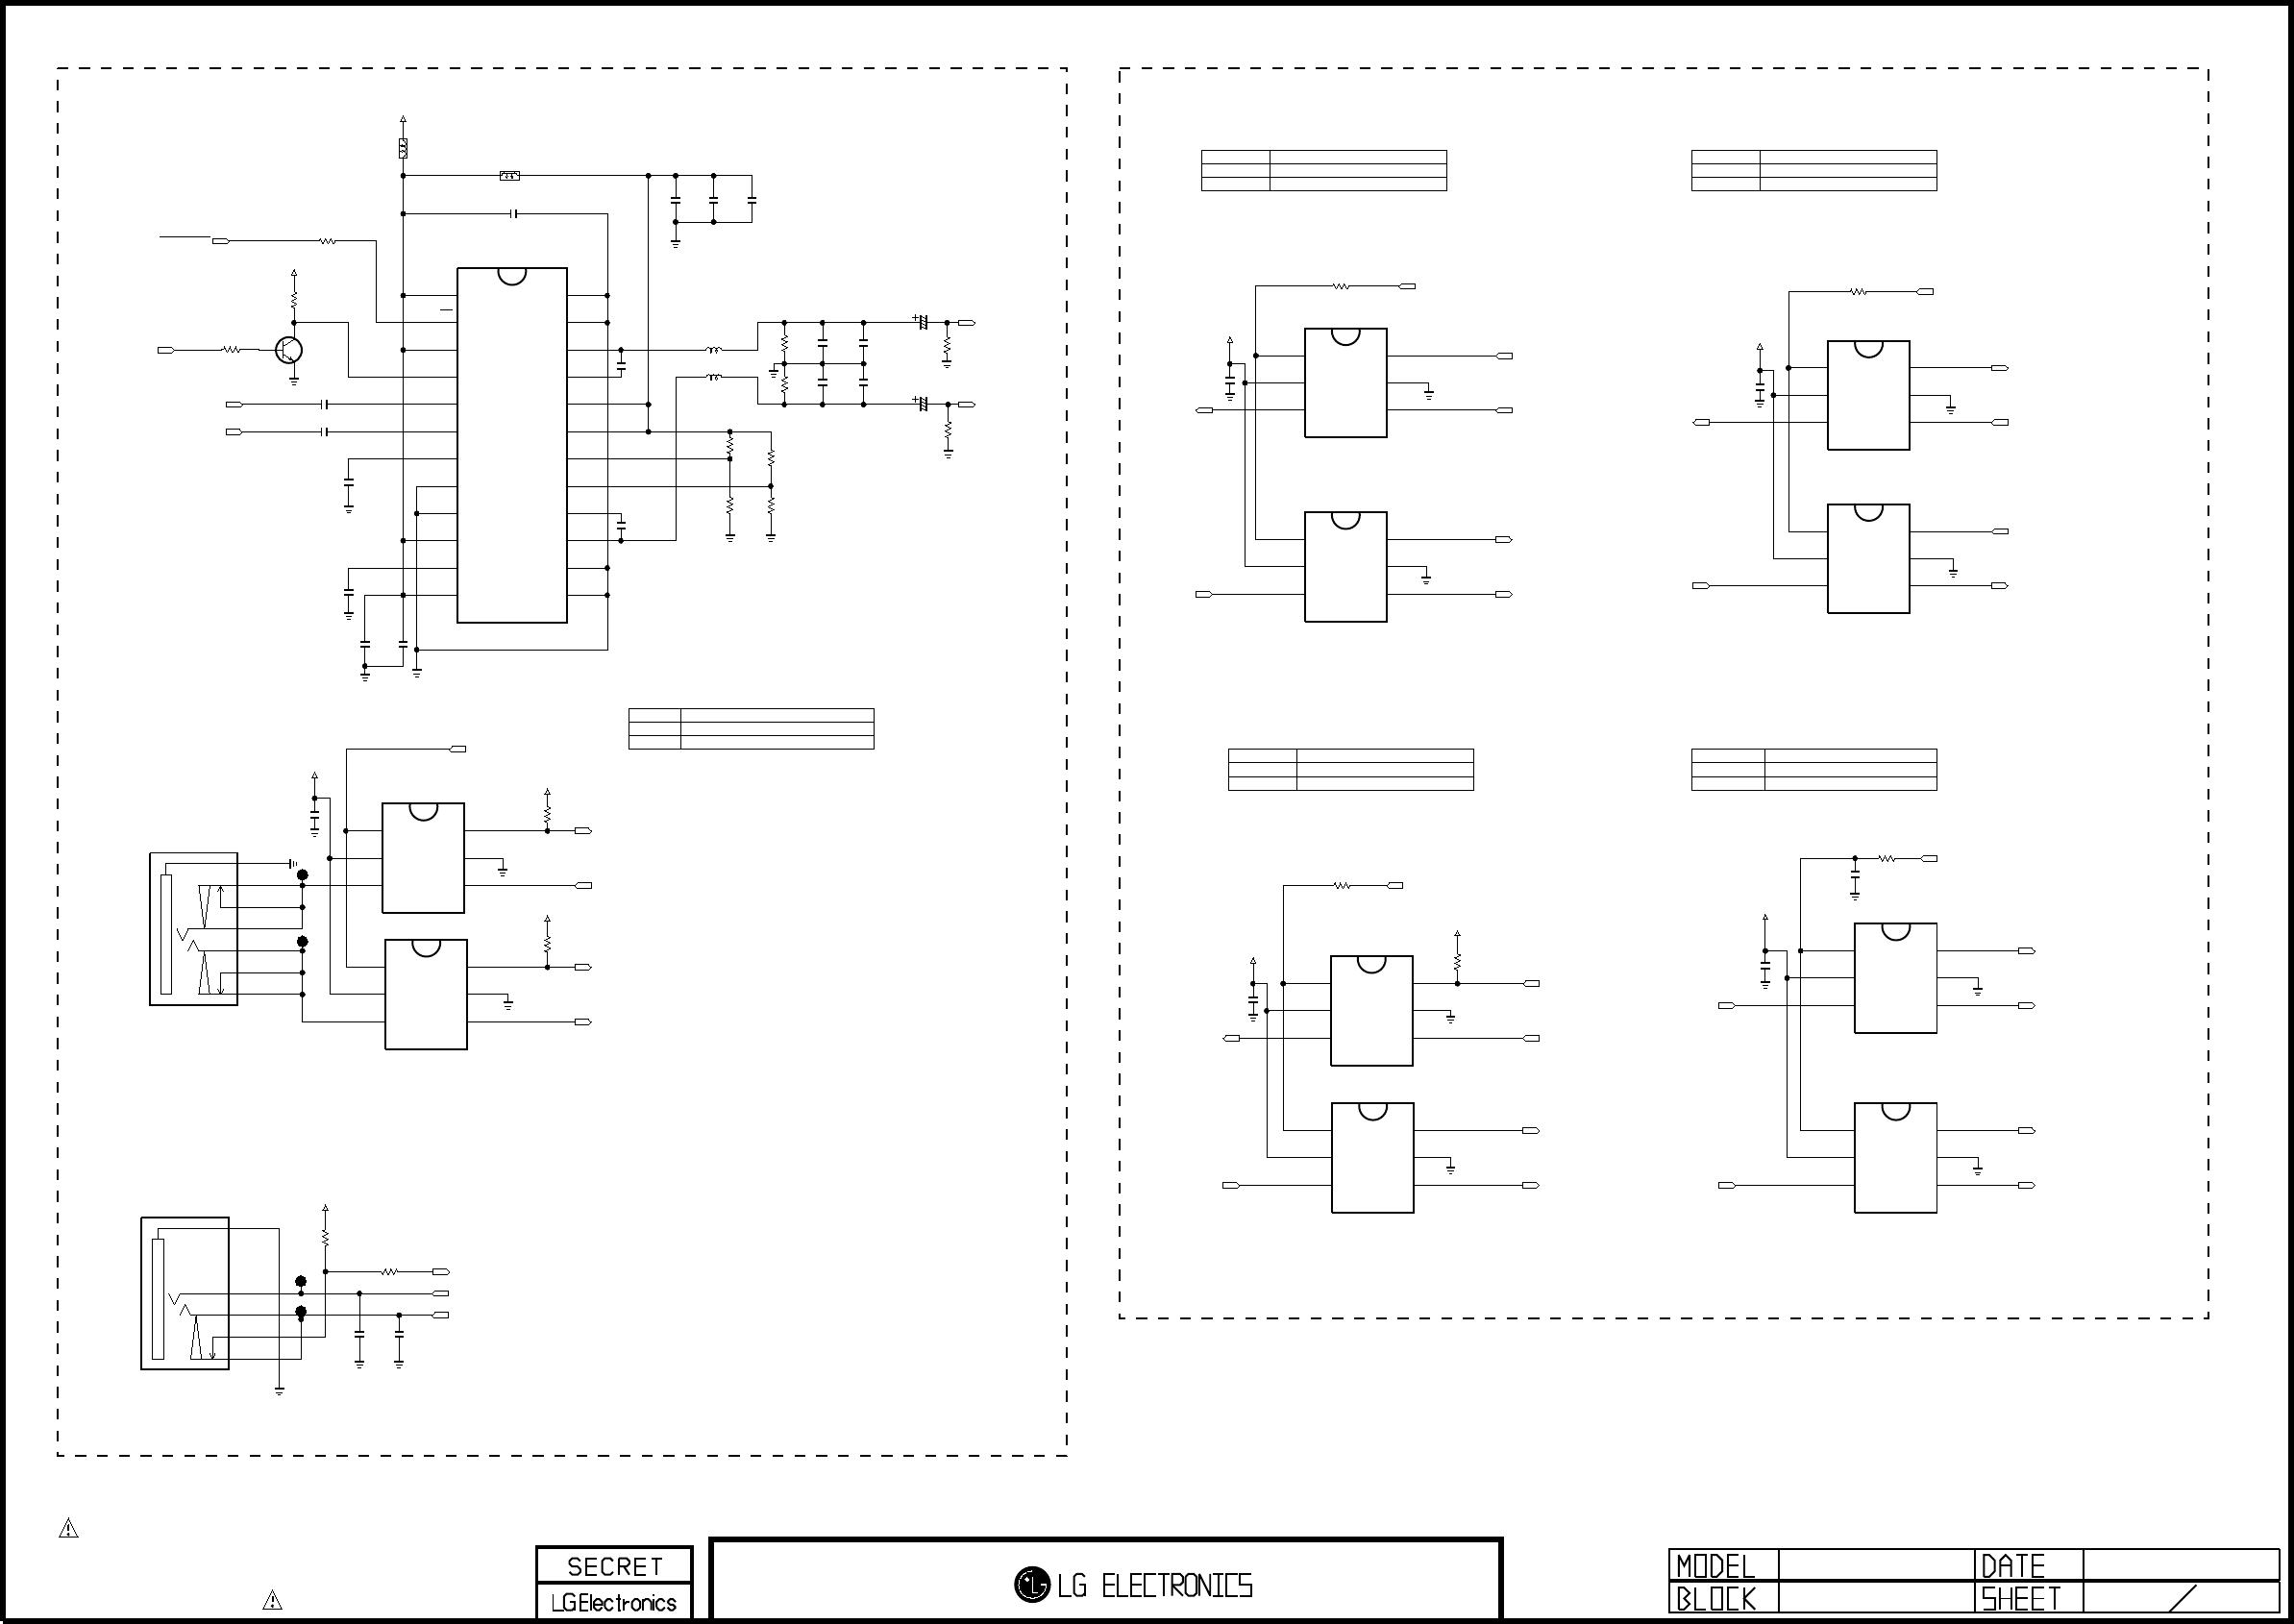 lg tv circuit board diagram wiring diagram database TV Component Parts Diagram lg 32ln549e za users manual lg tv owners manual lg tv circuit board diagram